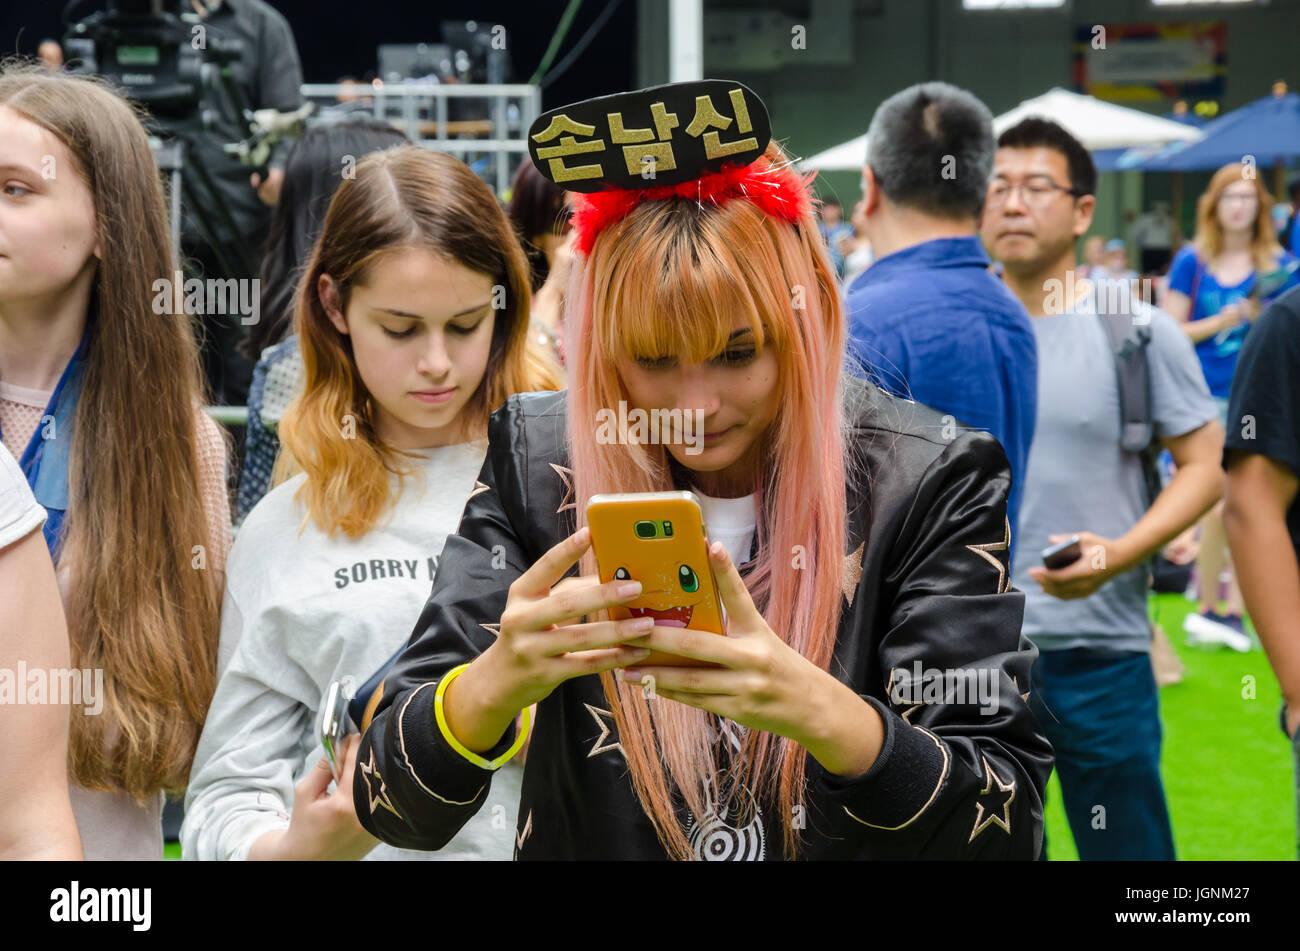 London, UK. 8. Juli 2017. London-koreanischen Festival in London Olympia. Matthew Ashmore/Alamy Live-Nachrichten Stockbild